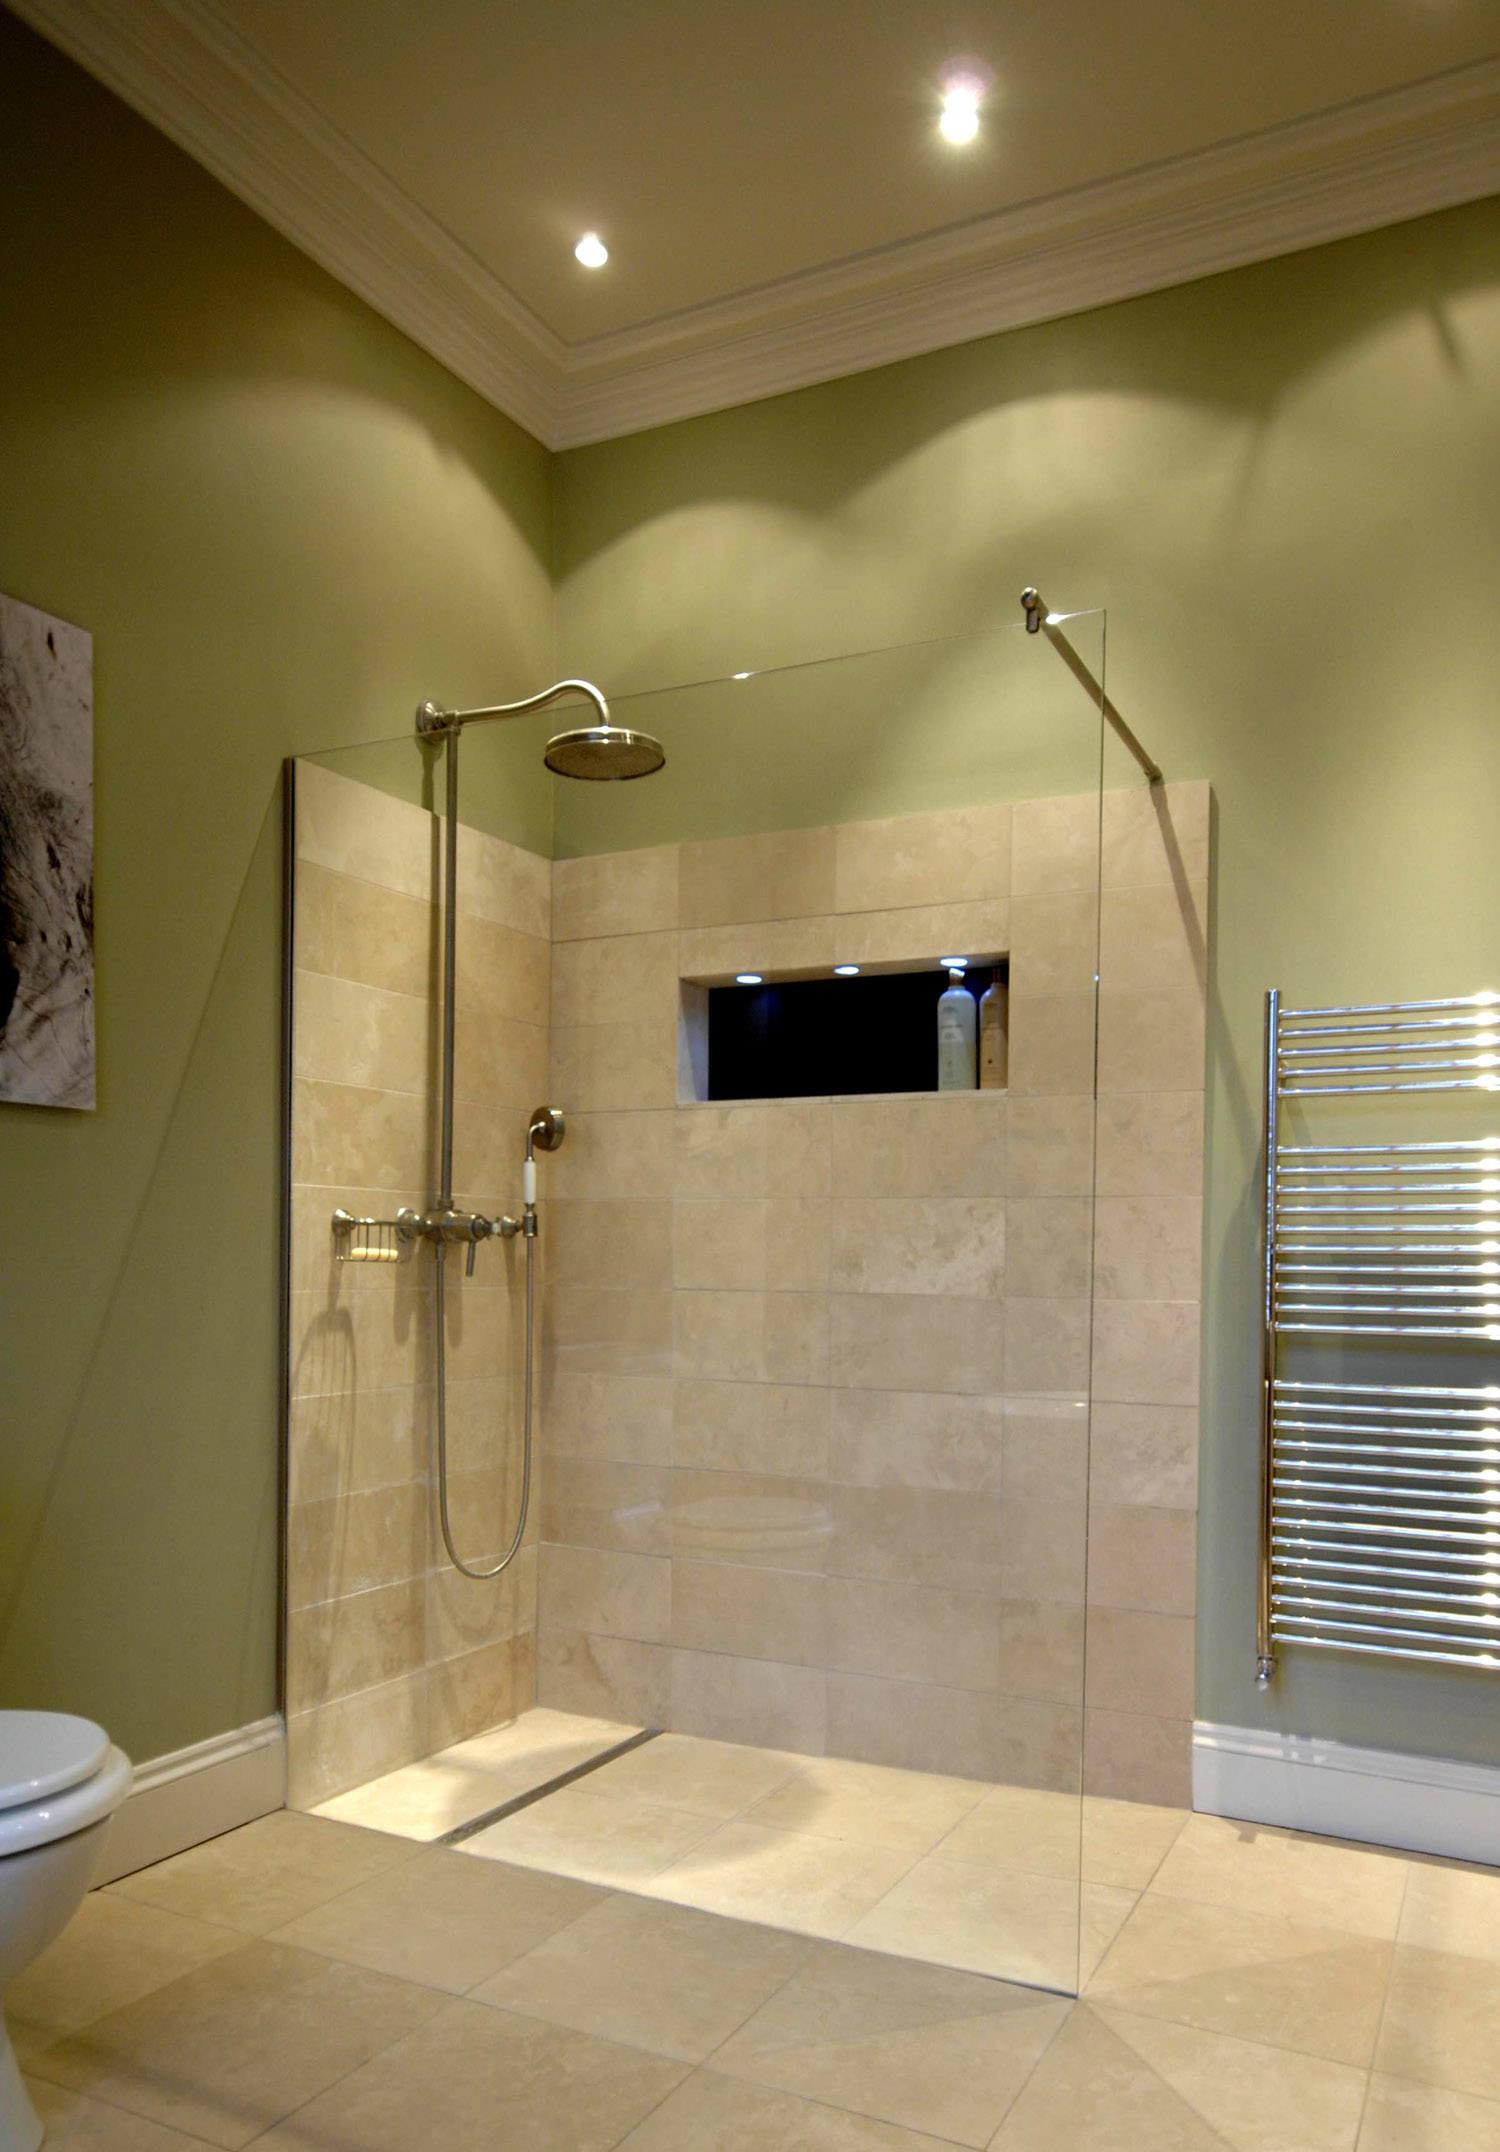 domjom.bathroom.shower.jpg